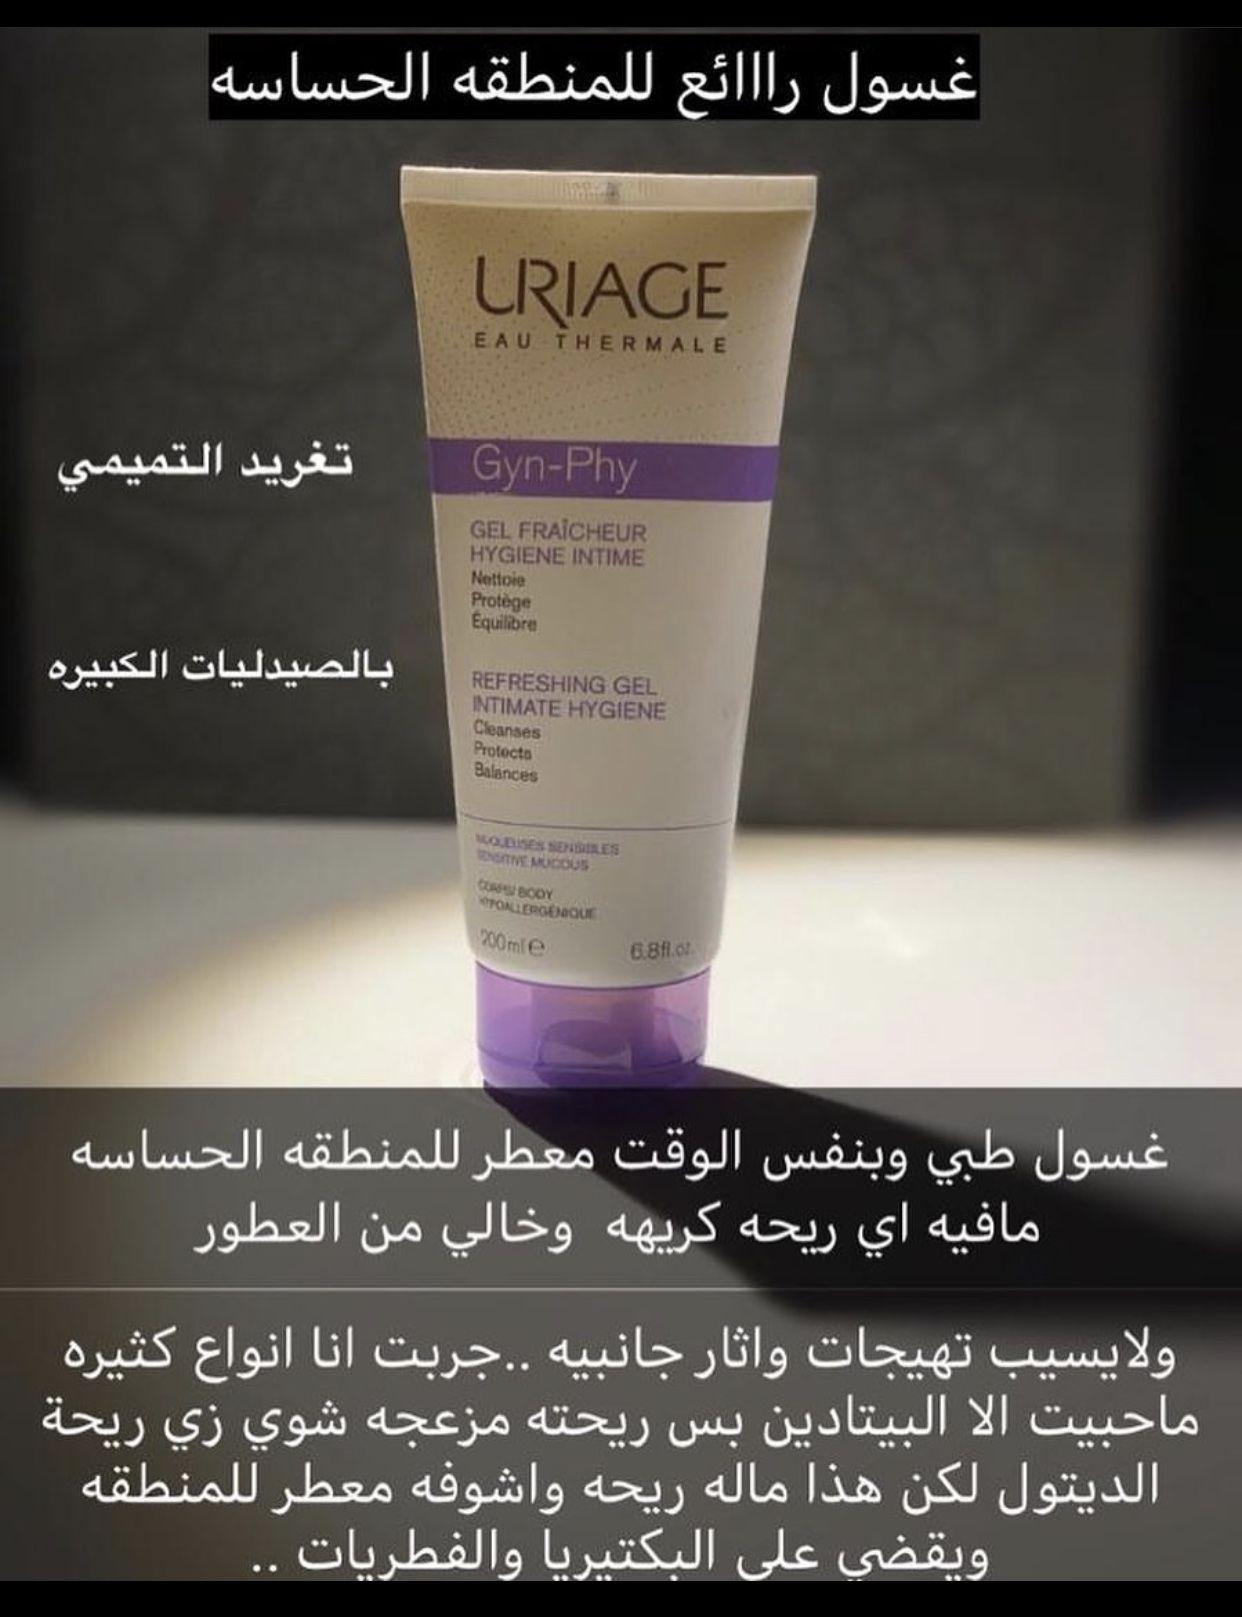 Pin By Dodi On نصايح وعناية Body Skin Care Beauty Skin Care Routine Skin Care Mask